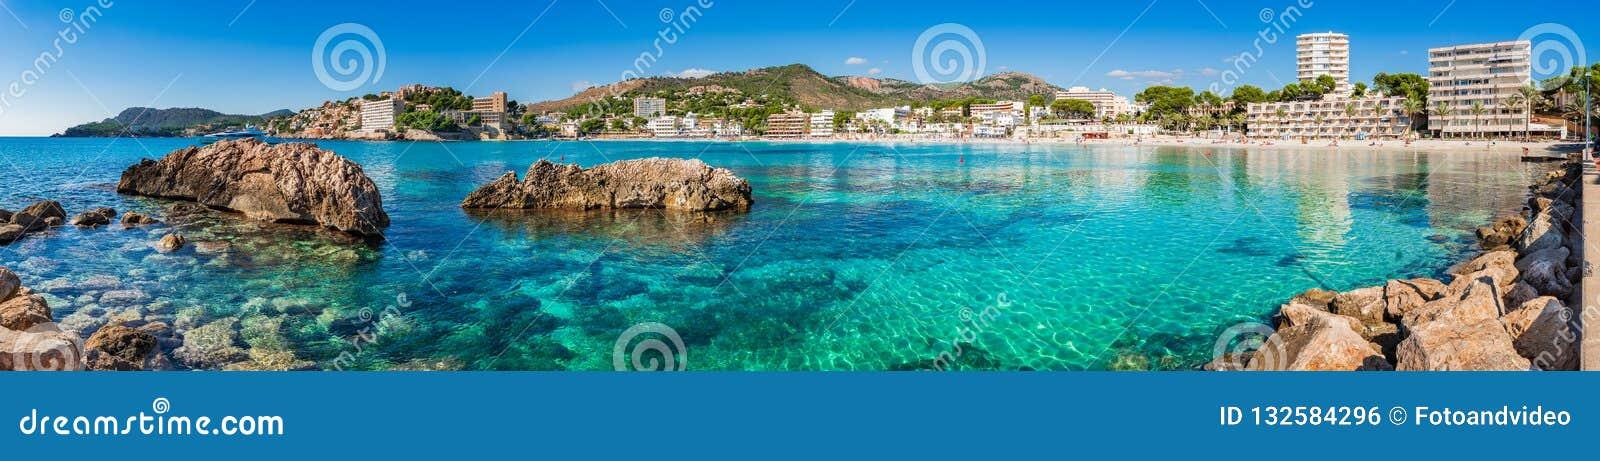 Spain Majorca, beach panorama of coast in Paguera